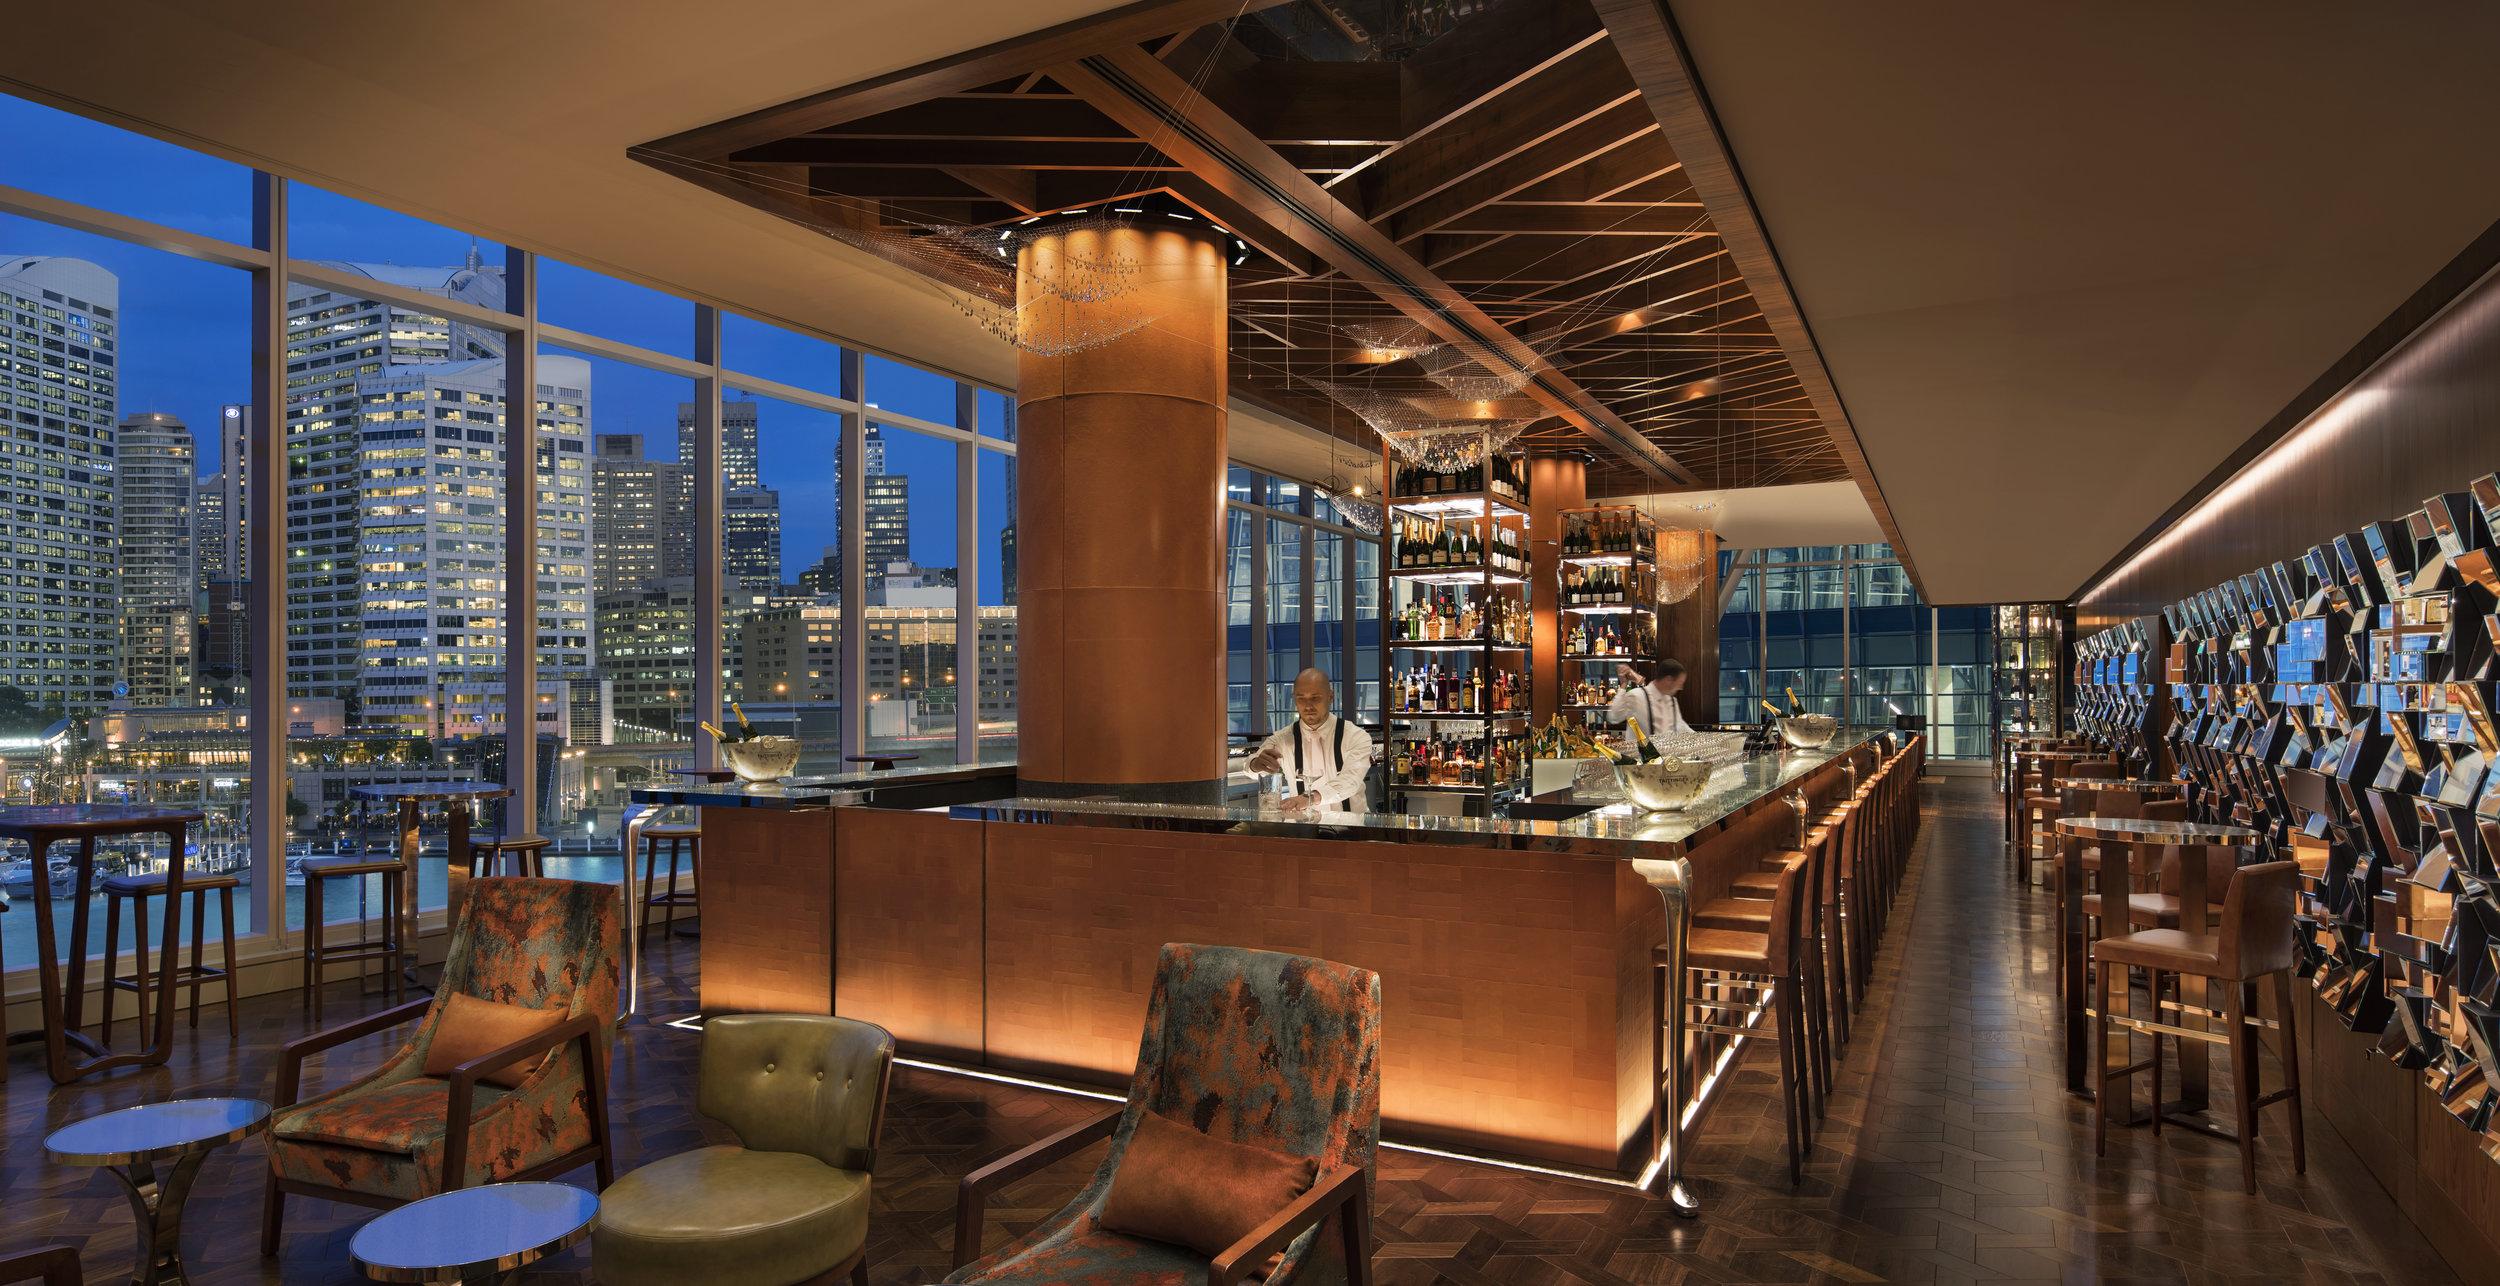 Champagne Bar | Photo Credit: Sofitel Sydney Darling Harbour